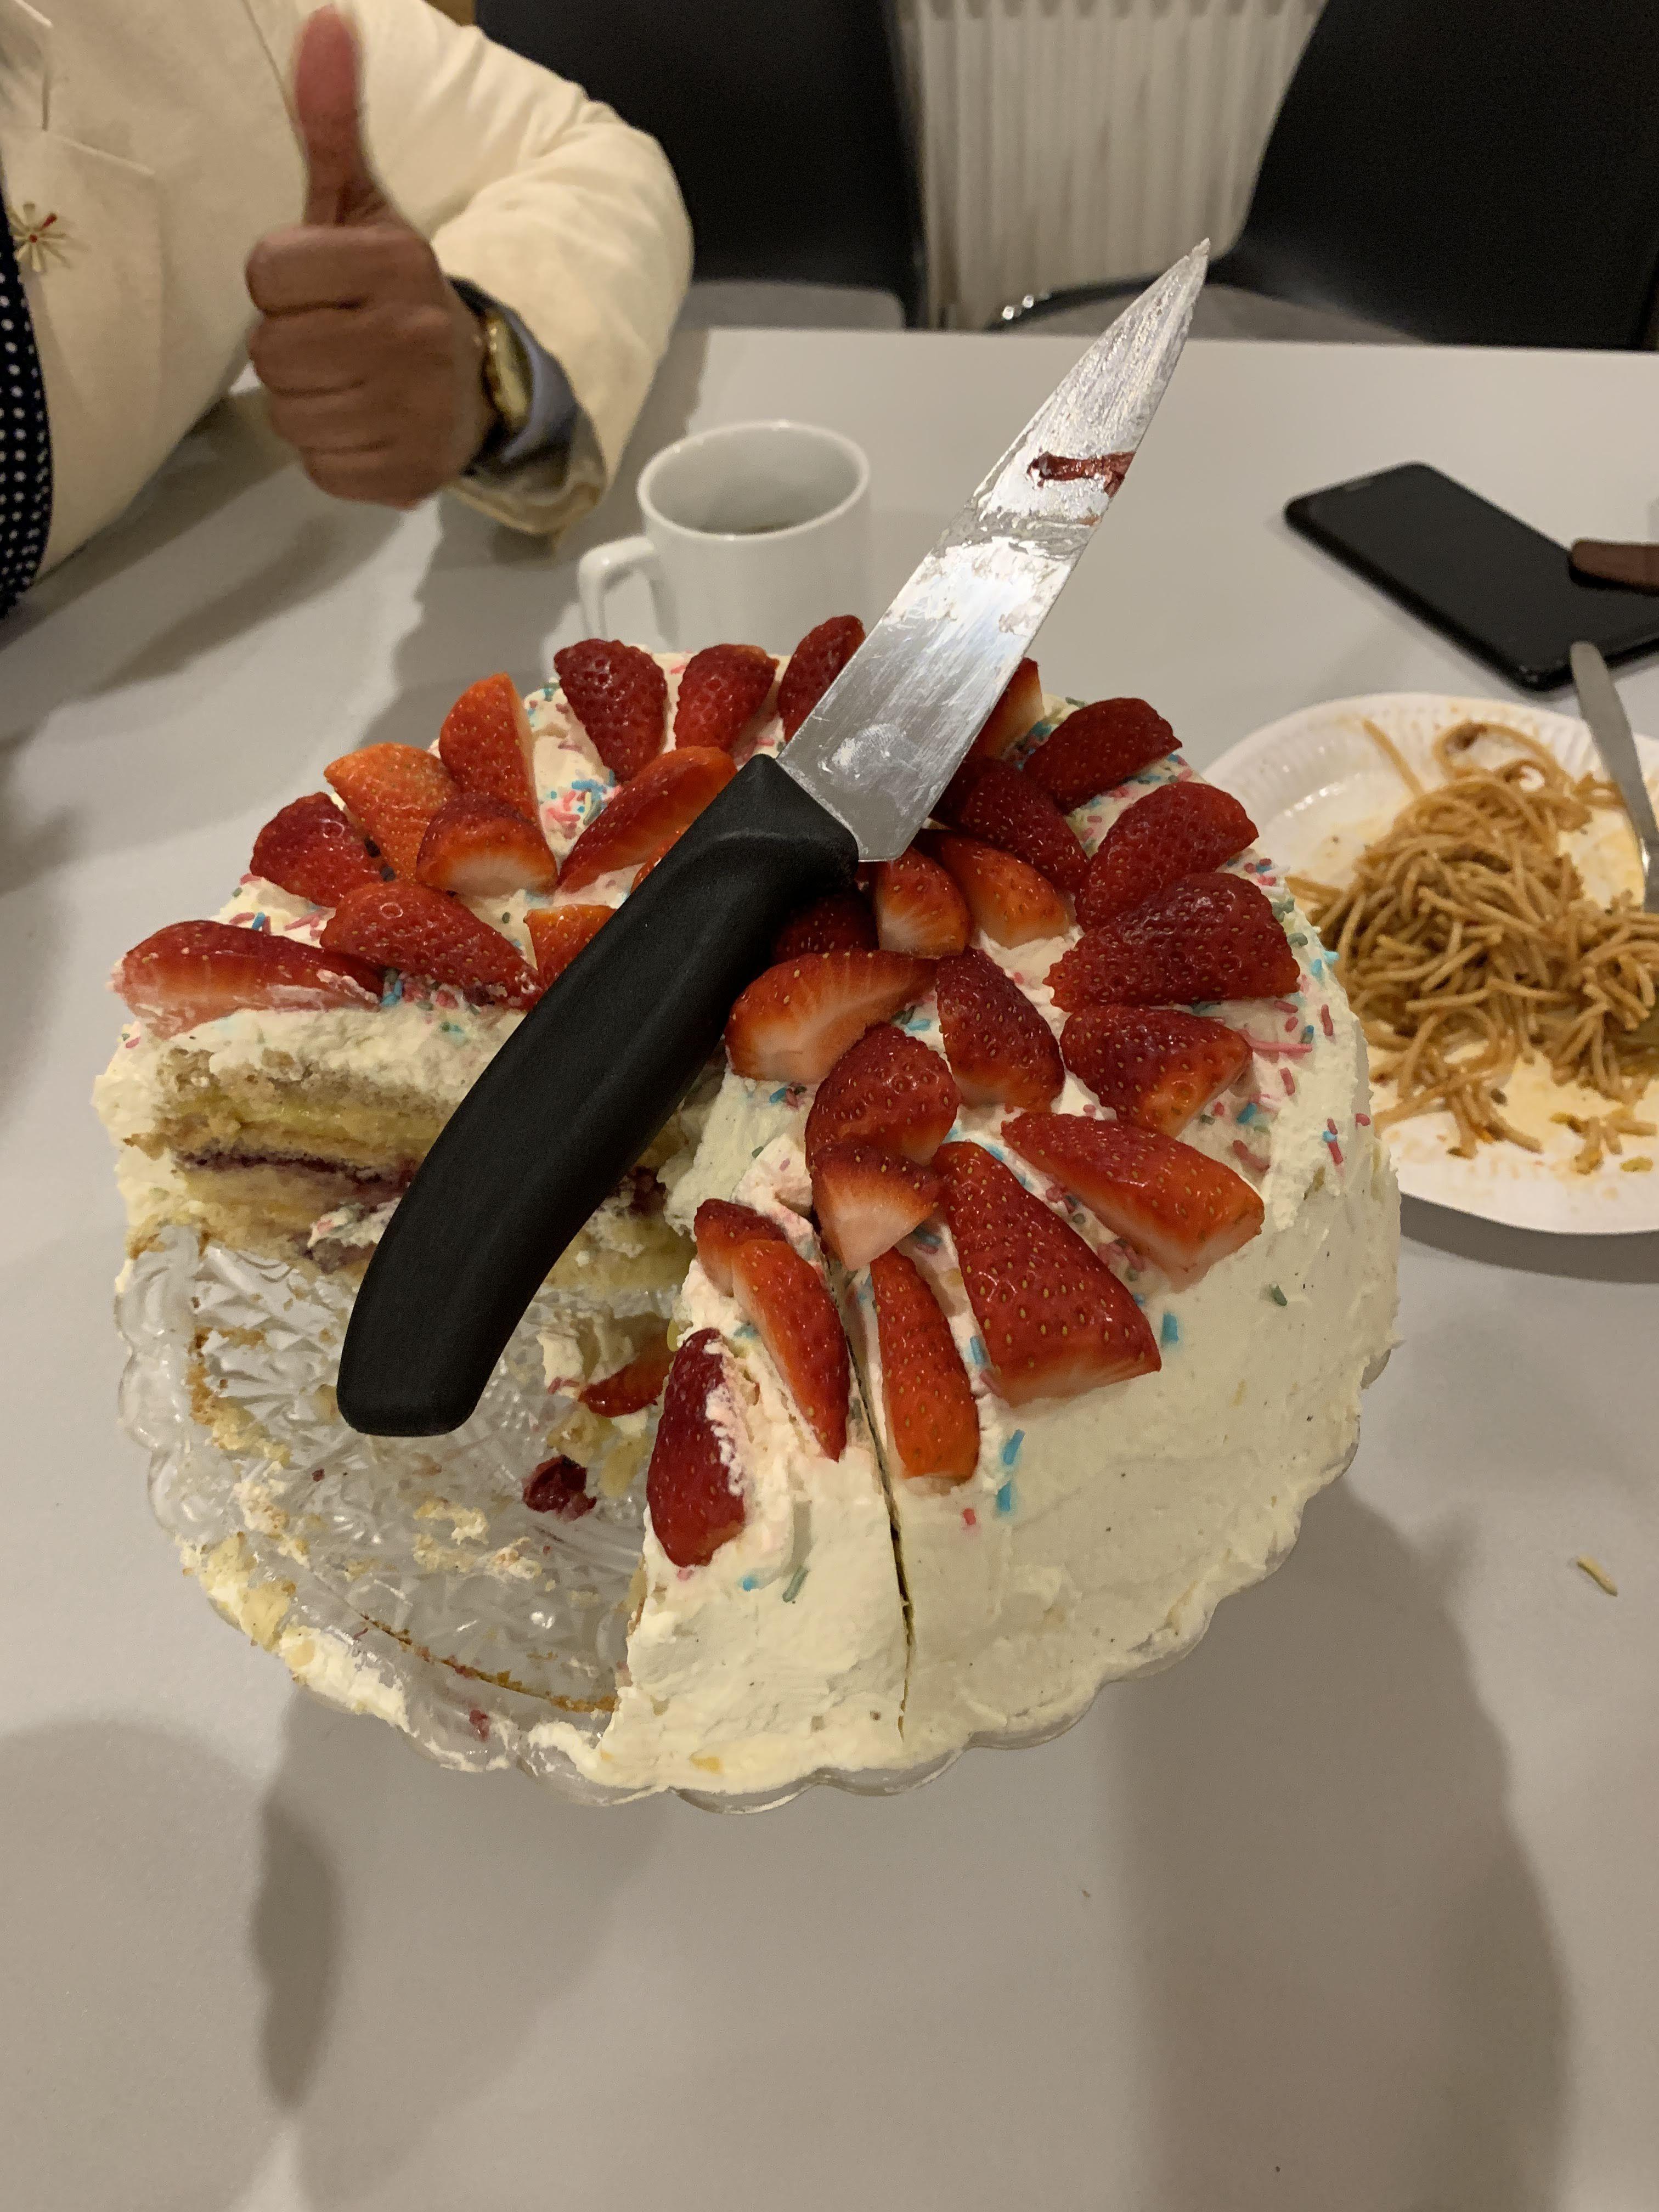 fællesspisning-den-28-12-2019-i-beboerhuset-på-Ellekonebakken-030